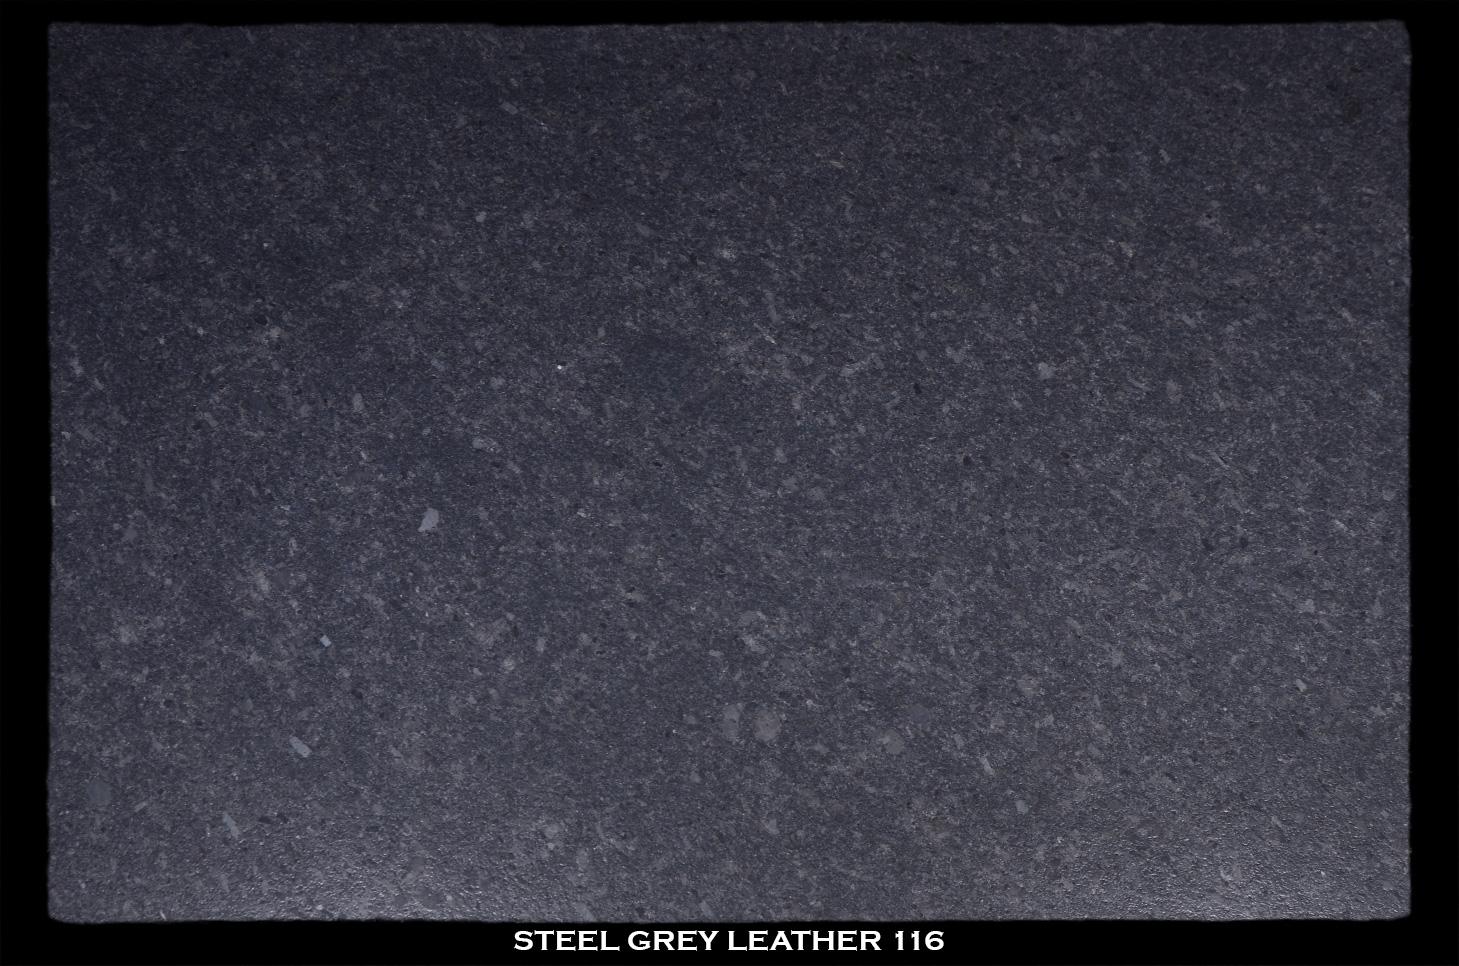 STEEL-GREY-LEATHER-116-SLAB